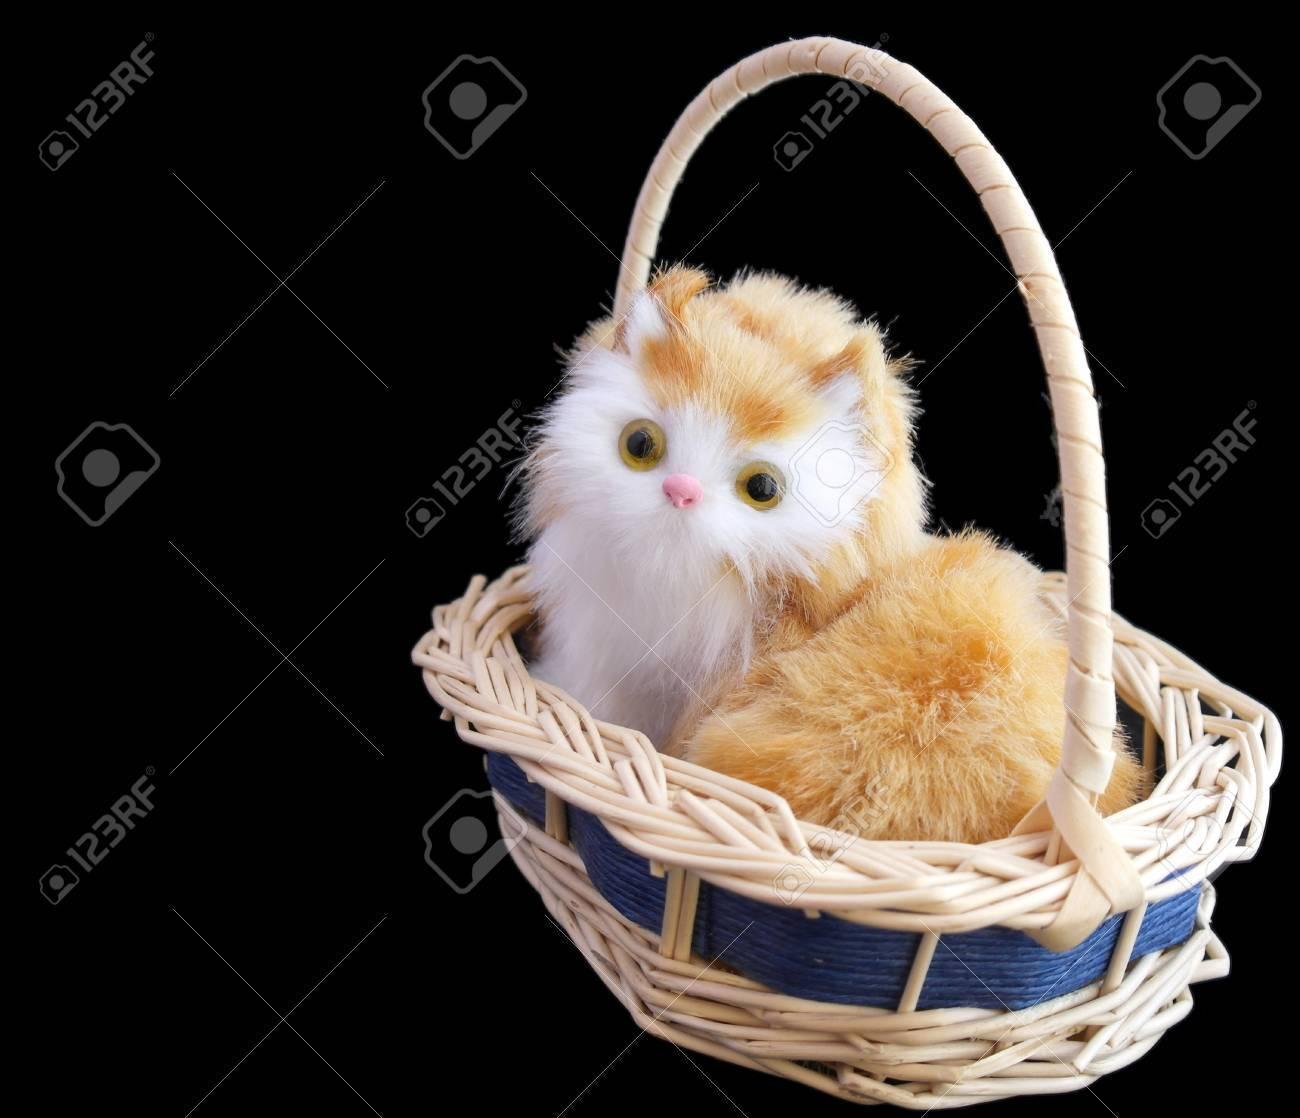 Pretty kitten in basket over black - 29791673